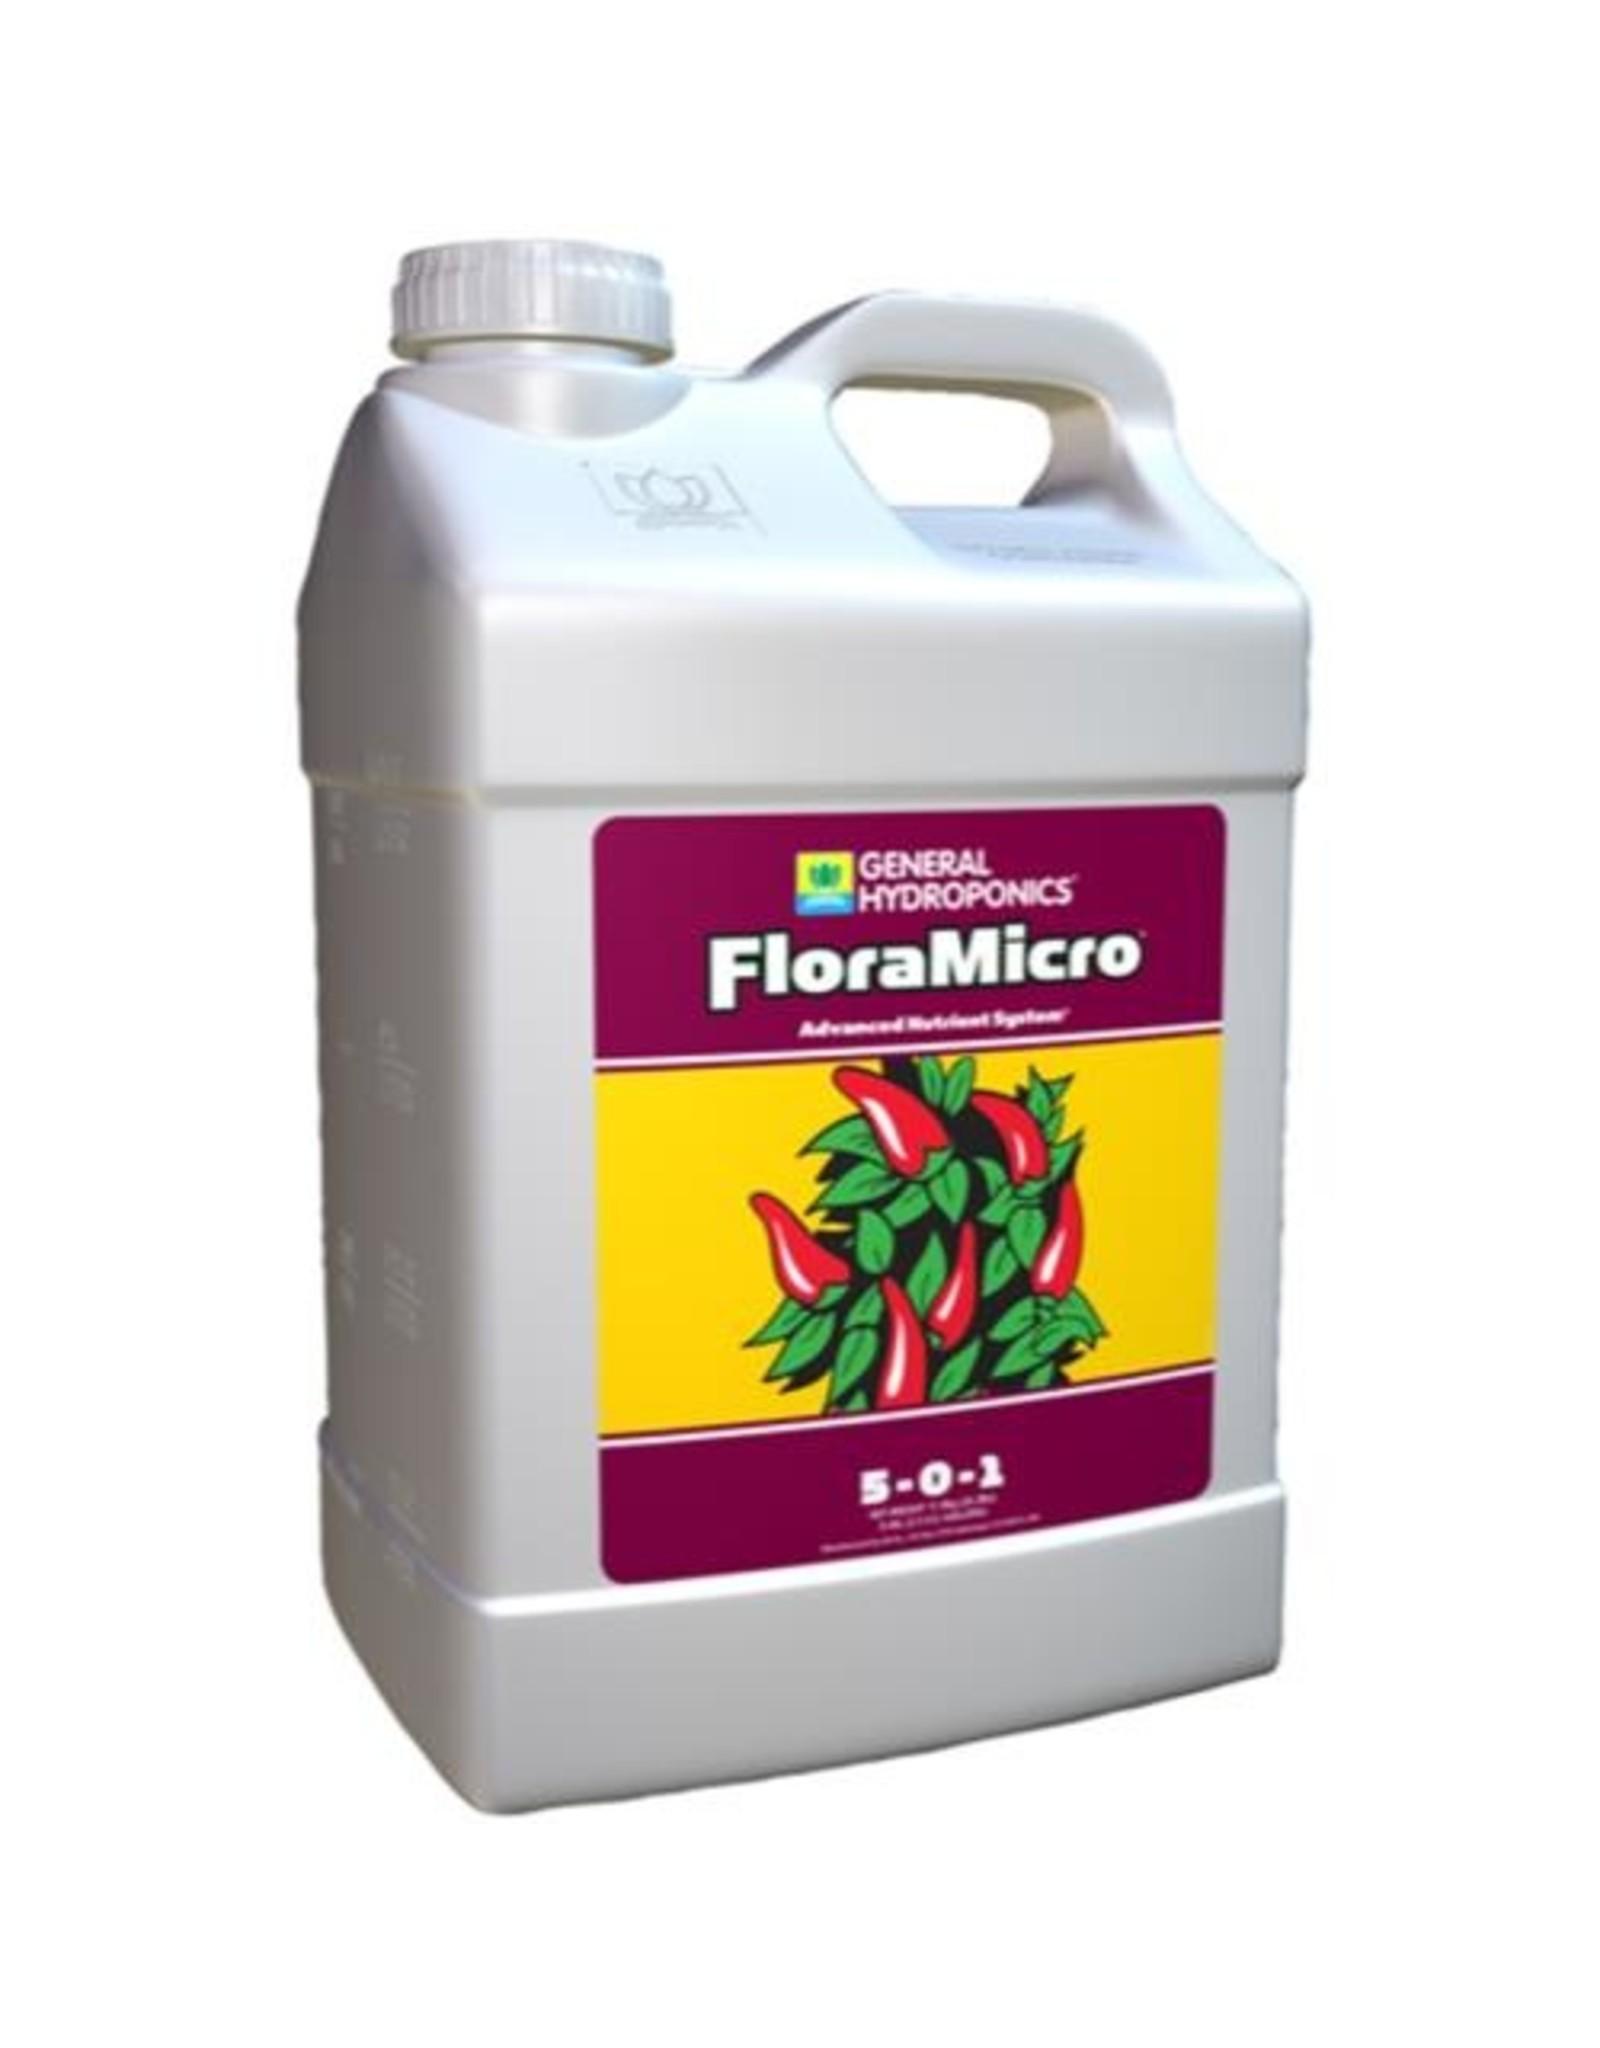 General Hydroponics GH Floramicro - 2.5 gal